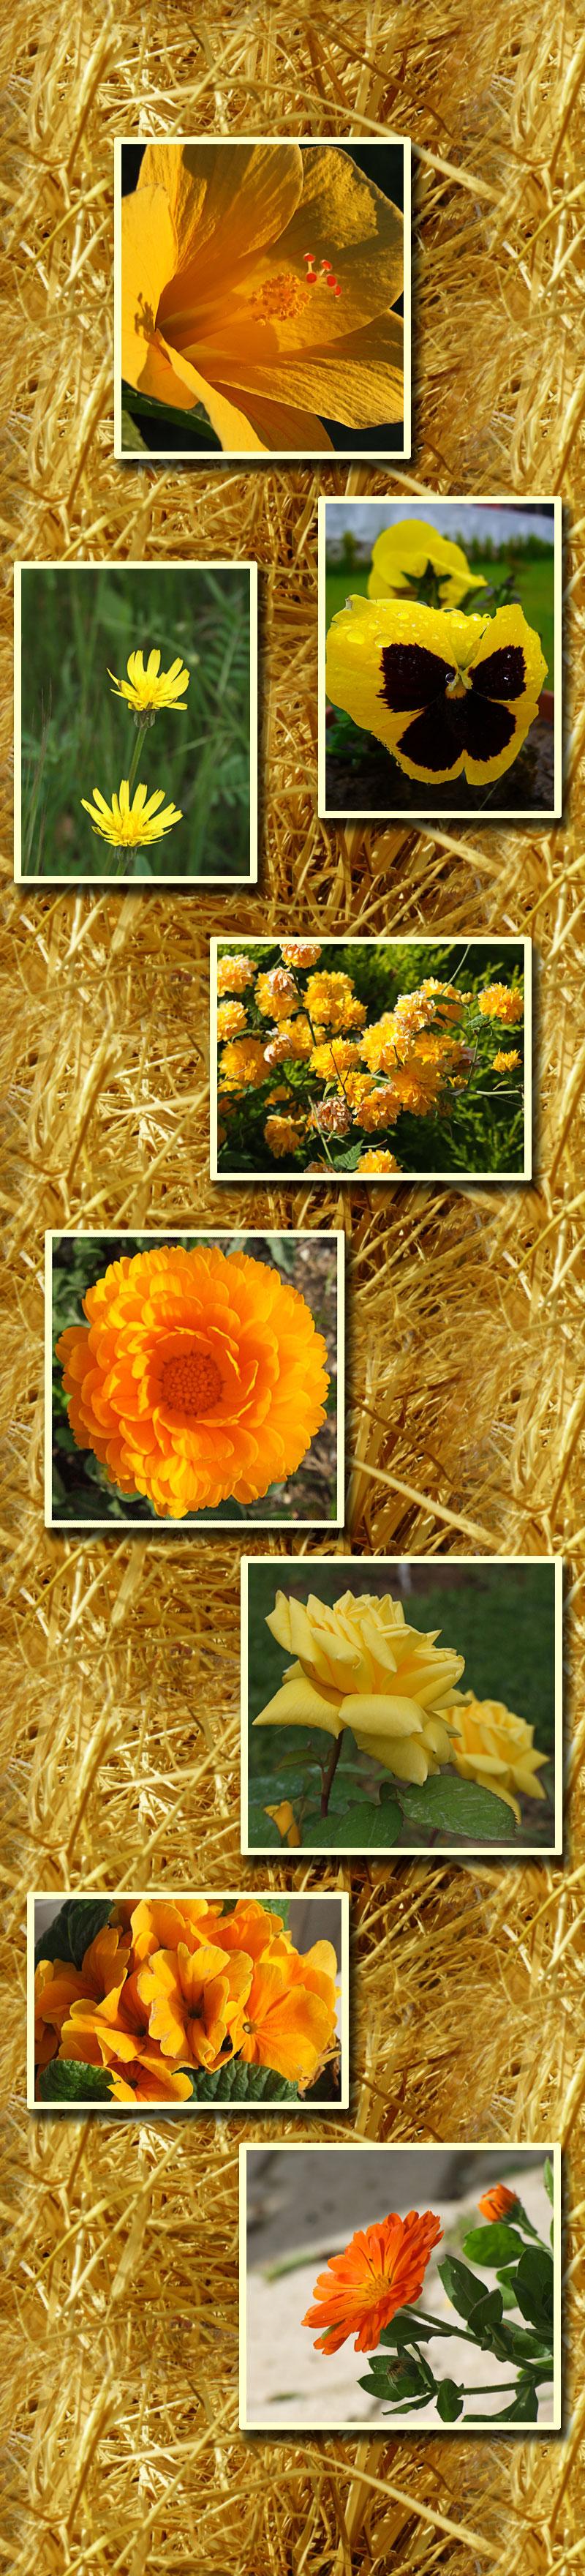 Rhapsodie en jaune